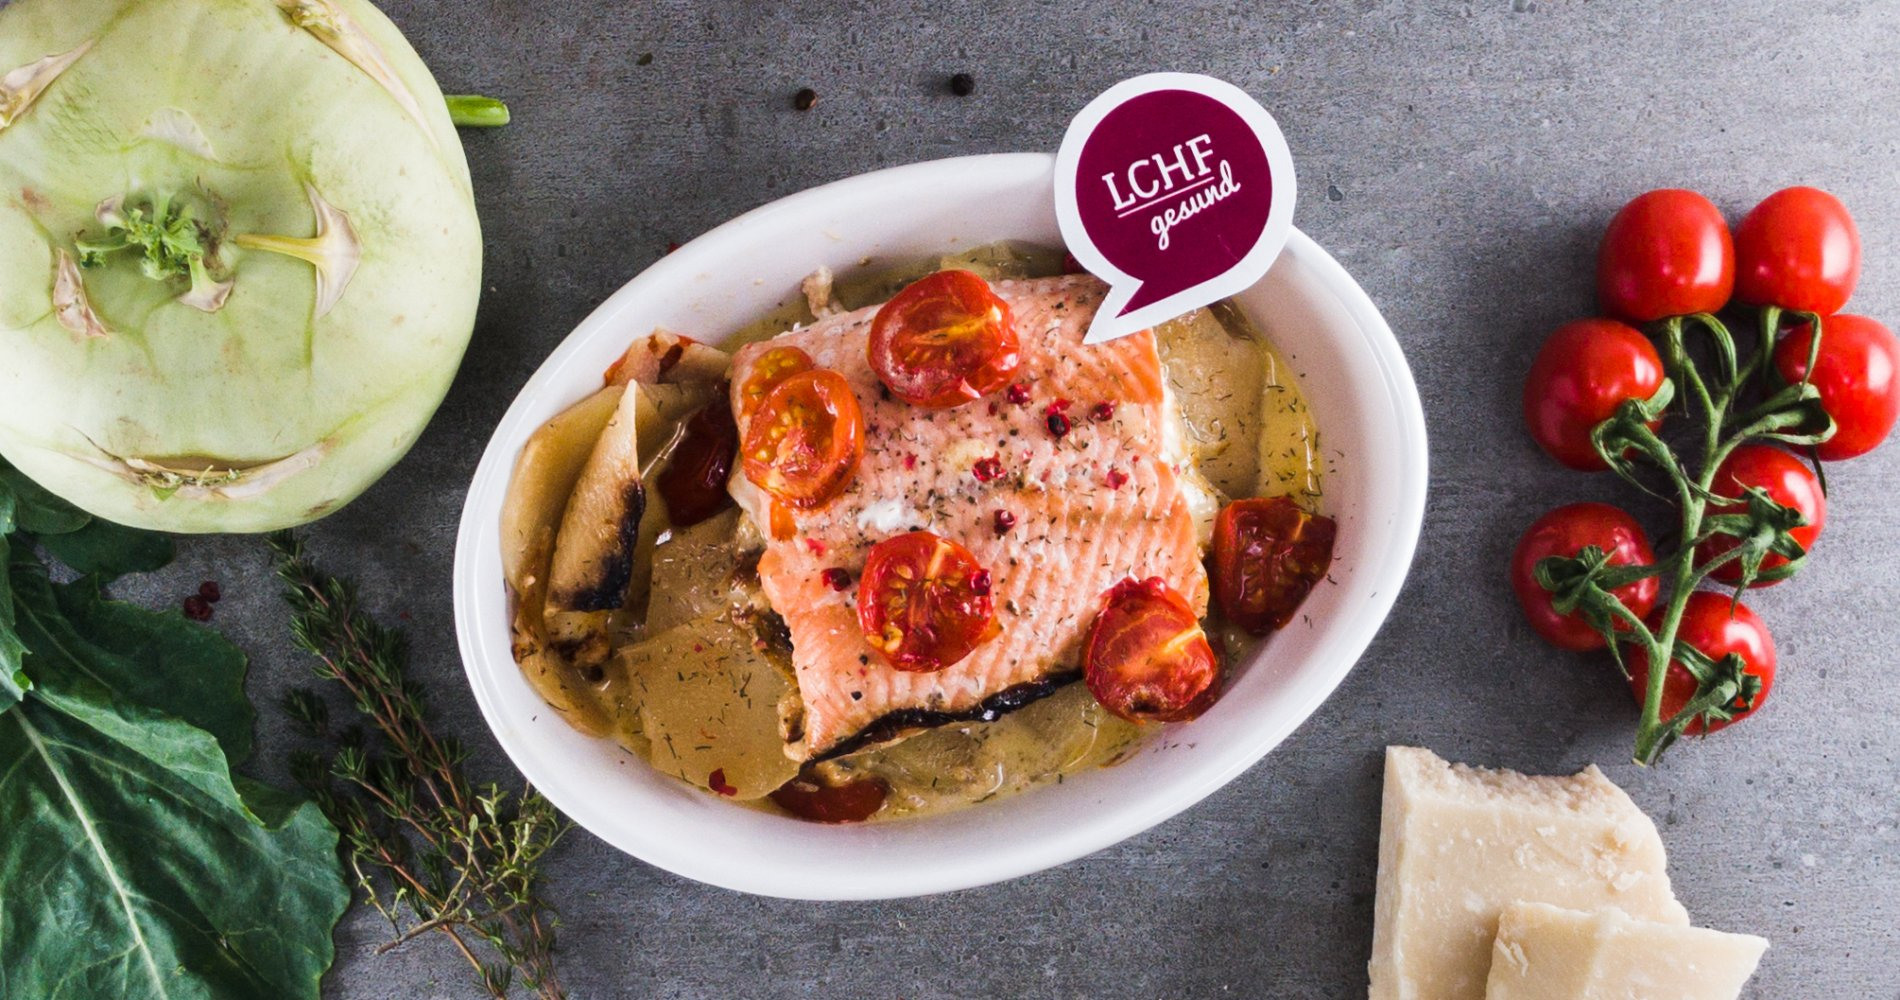 Rezept Low Carb: Kohlrabi-Lachs-Gratin - LCHF-gesund.de